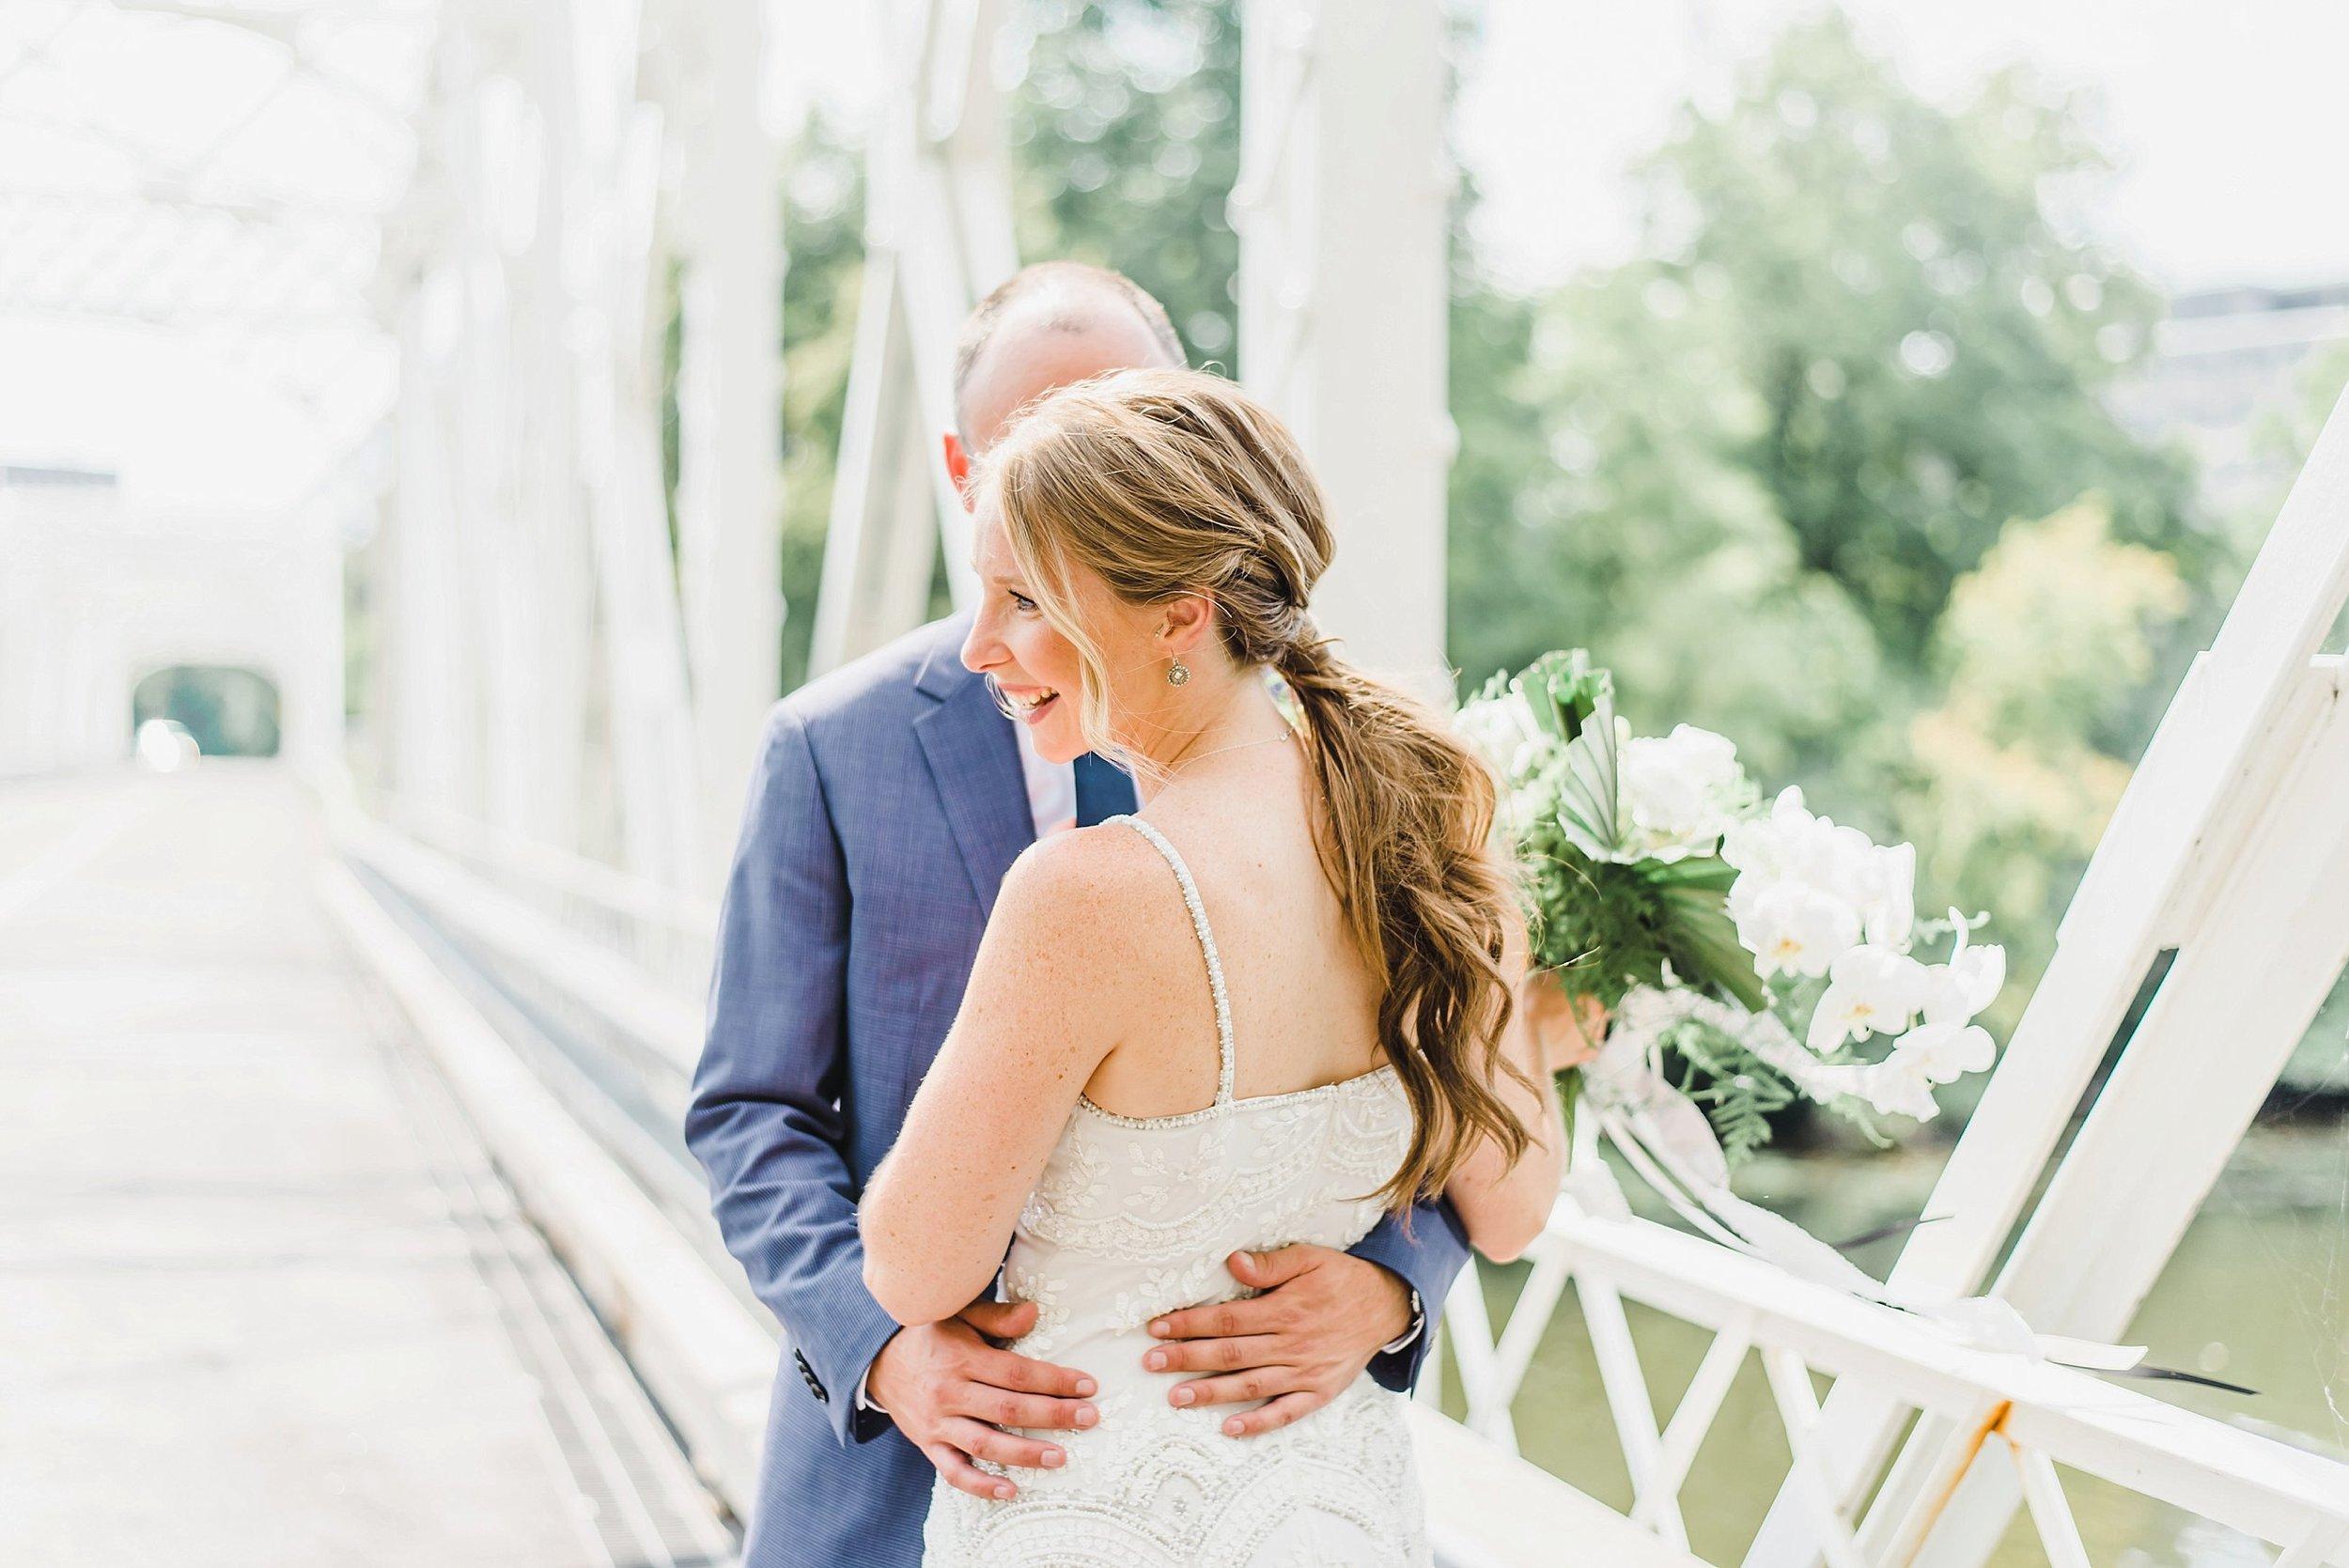 light airy indie fine art ottawa wedding photographer | Ali and Batoul Photography_0641.jpg